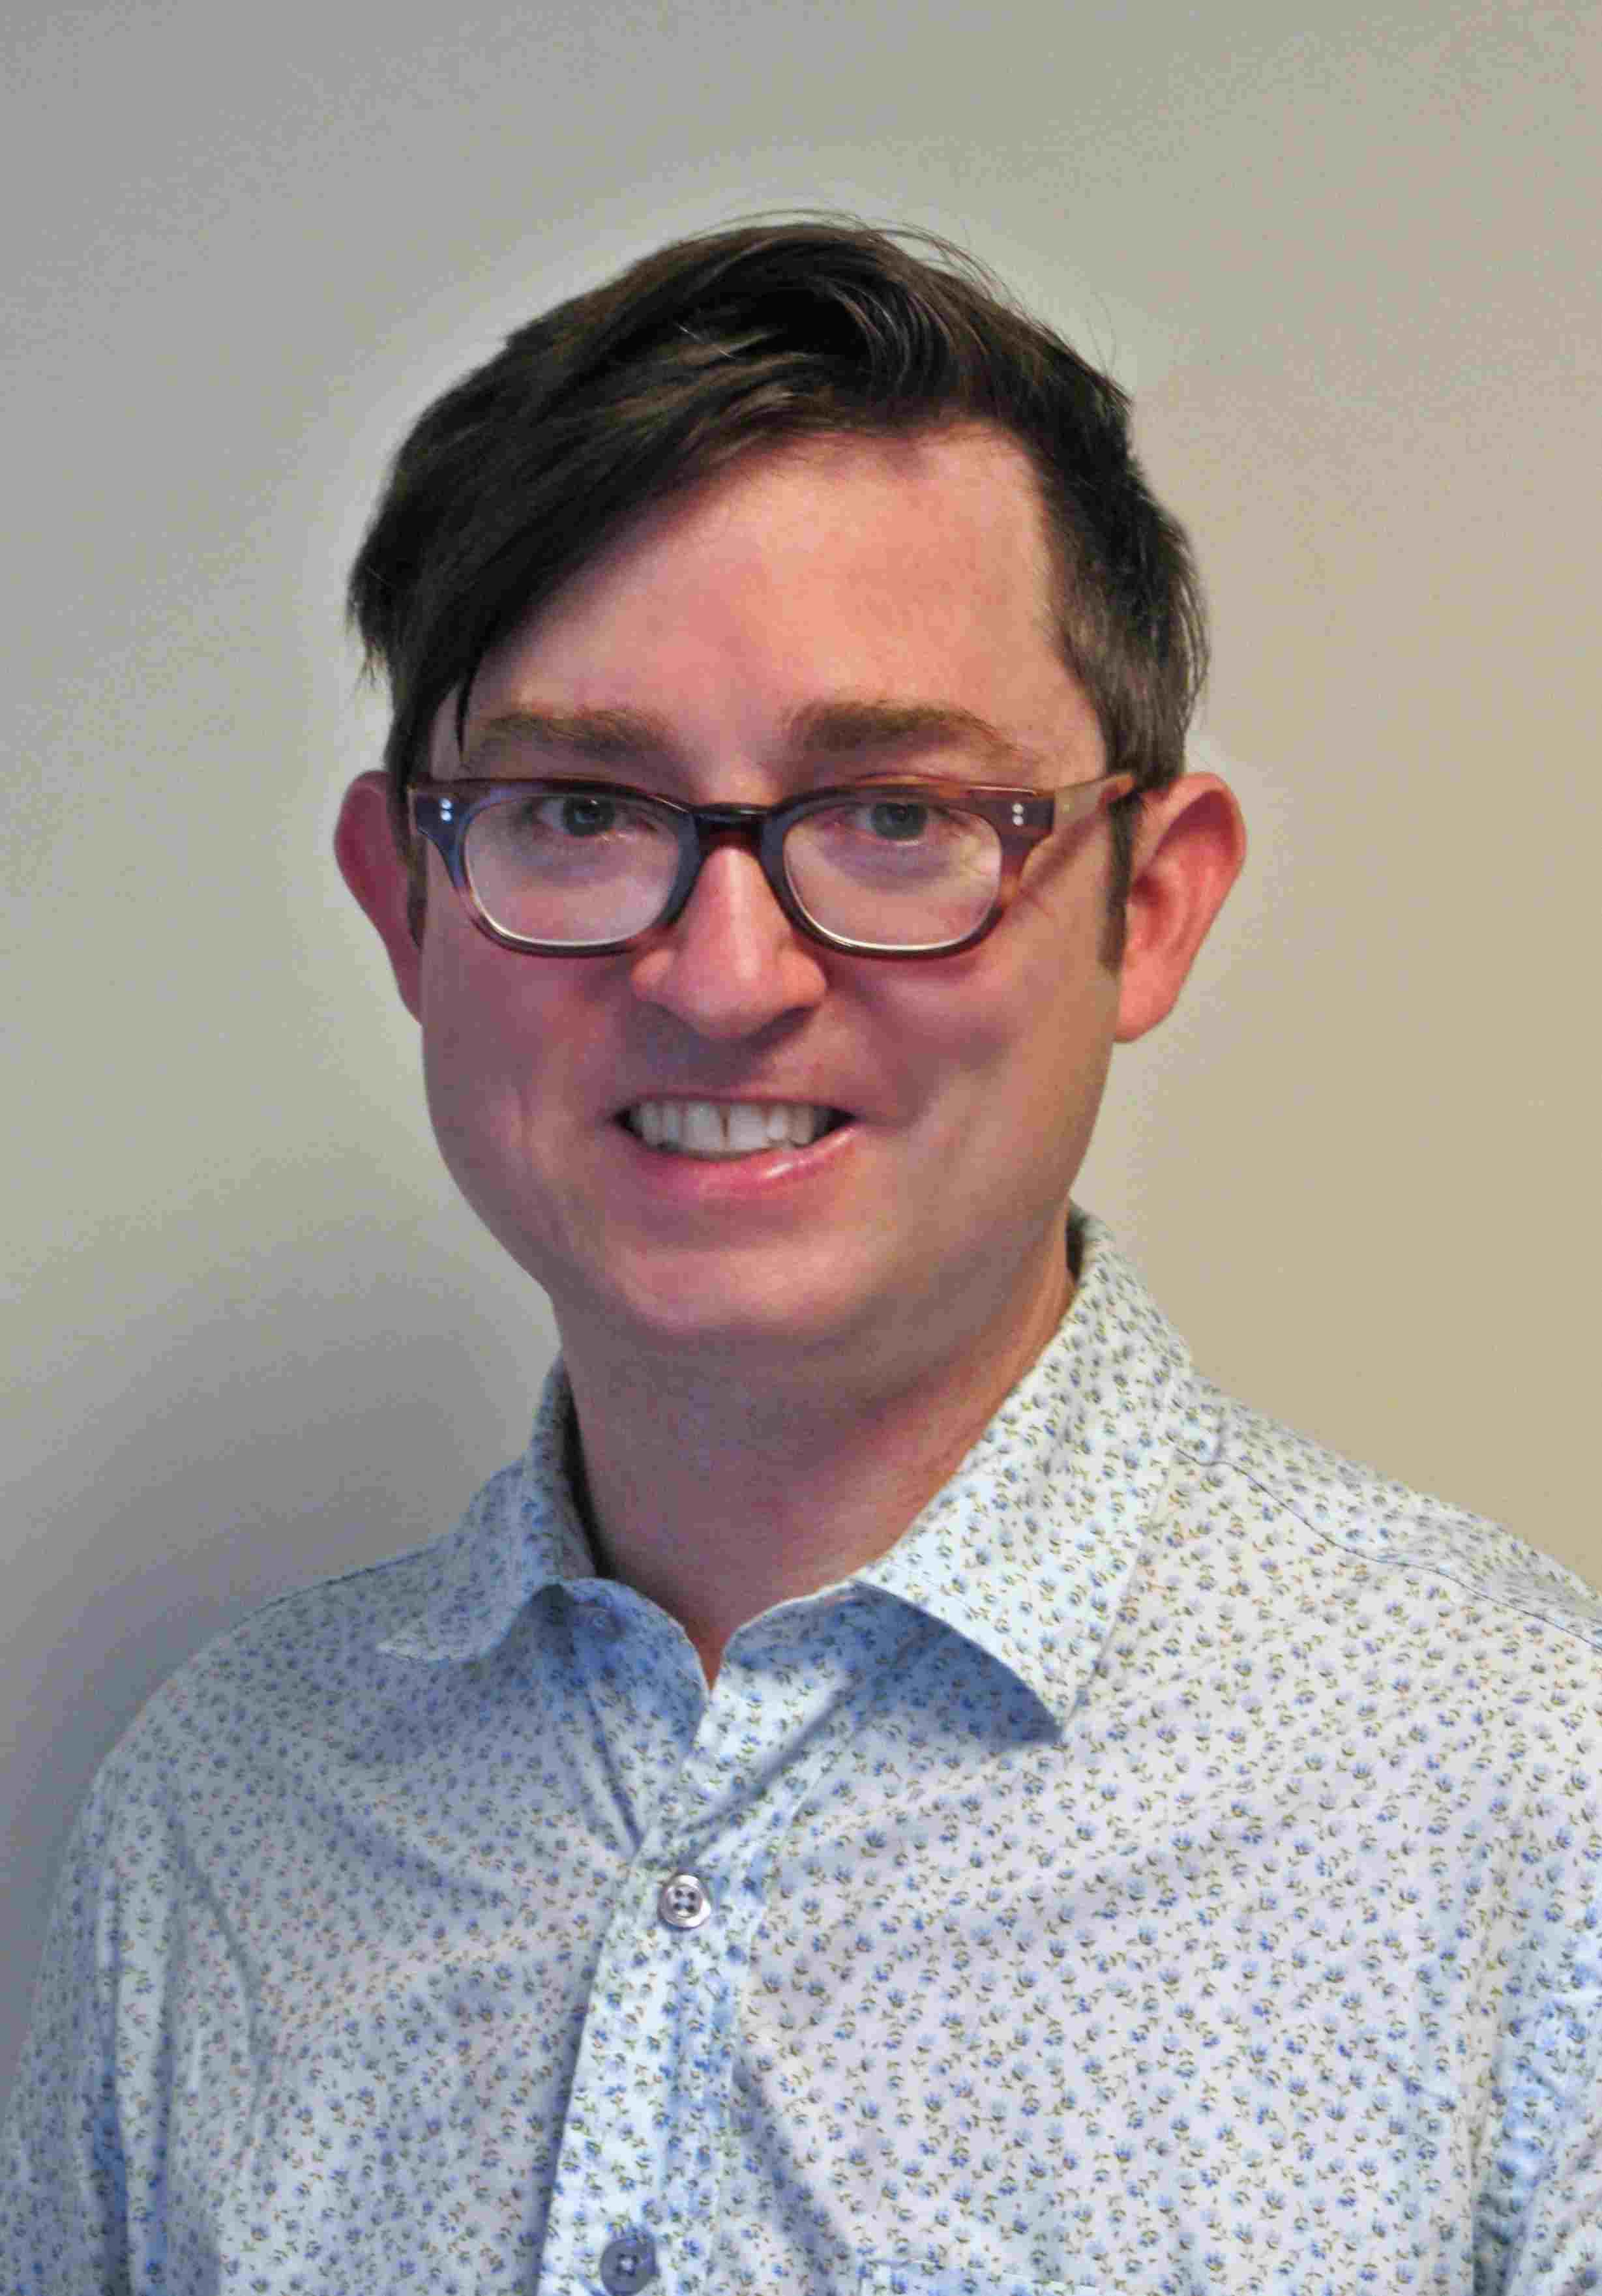 James Leo Cahill, Associate Professor